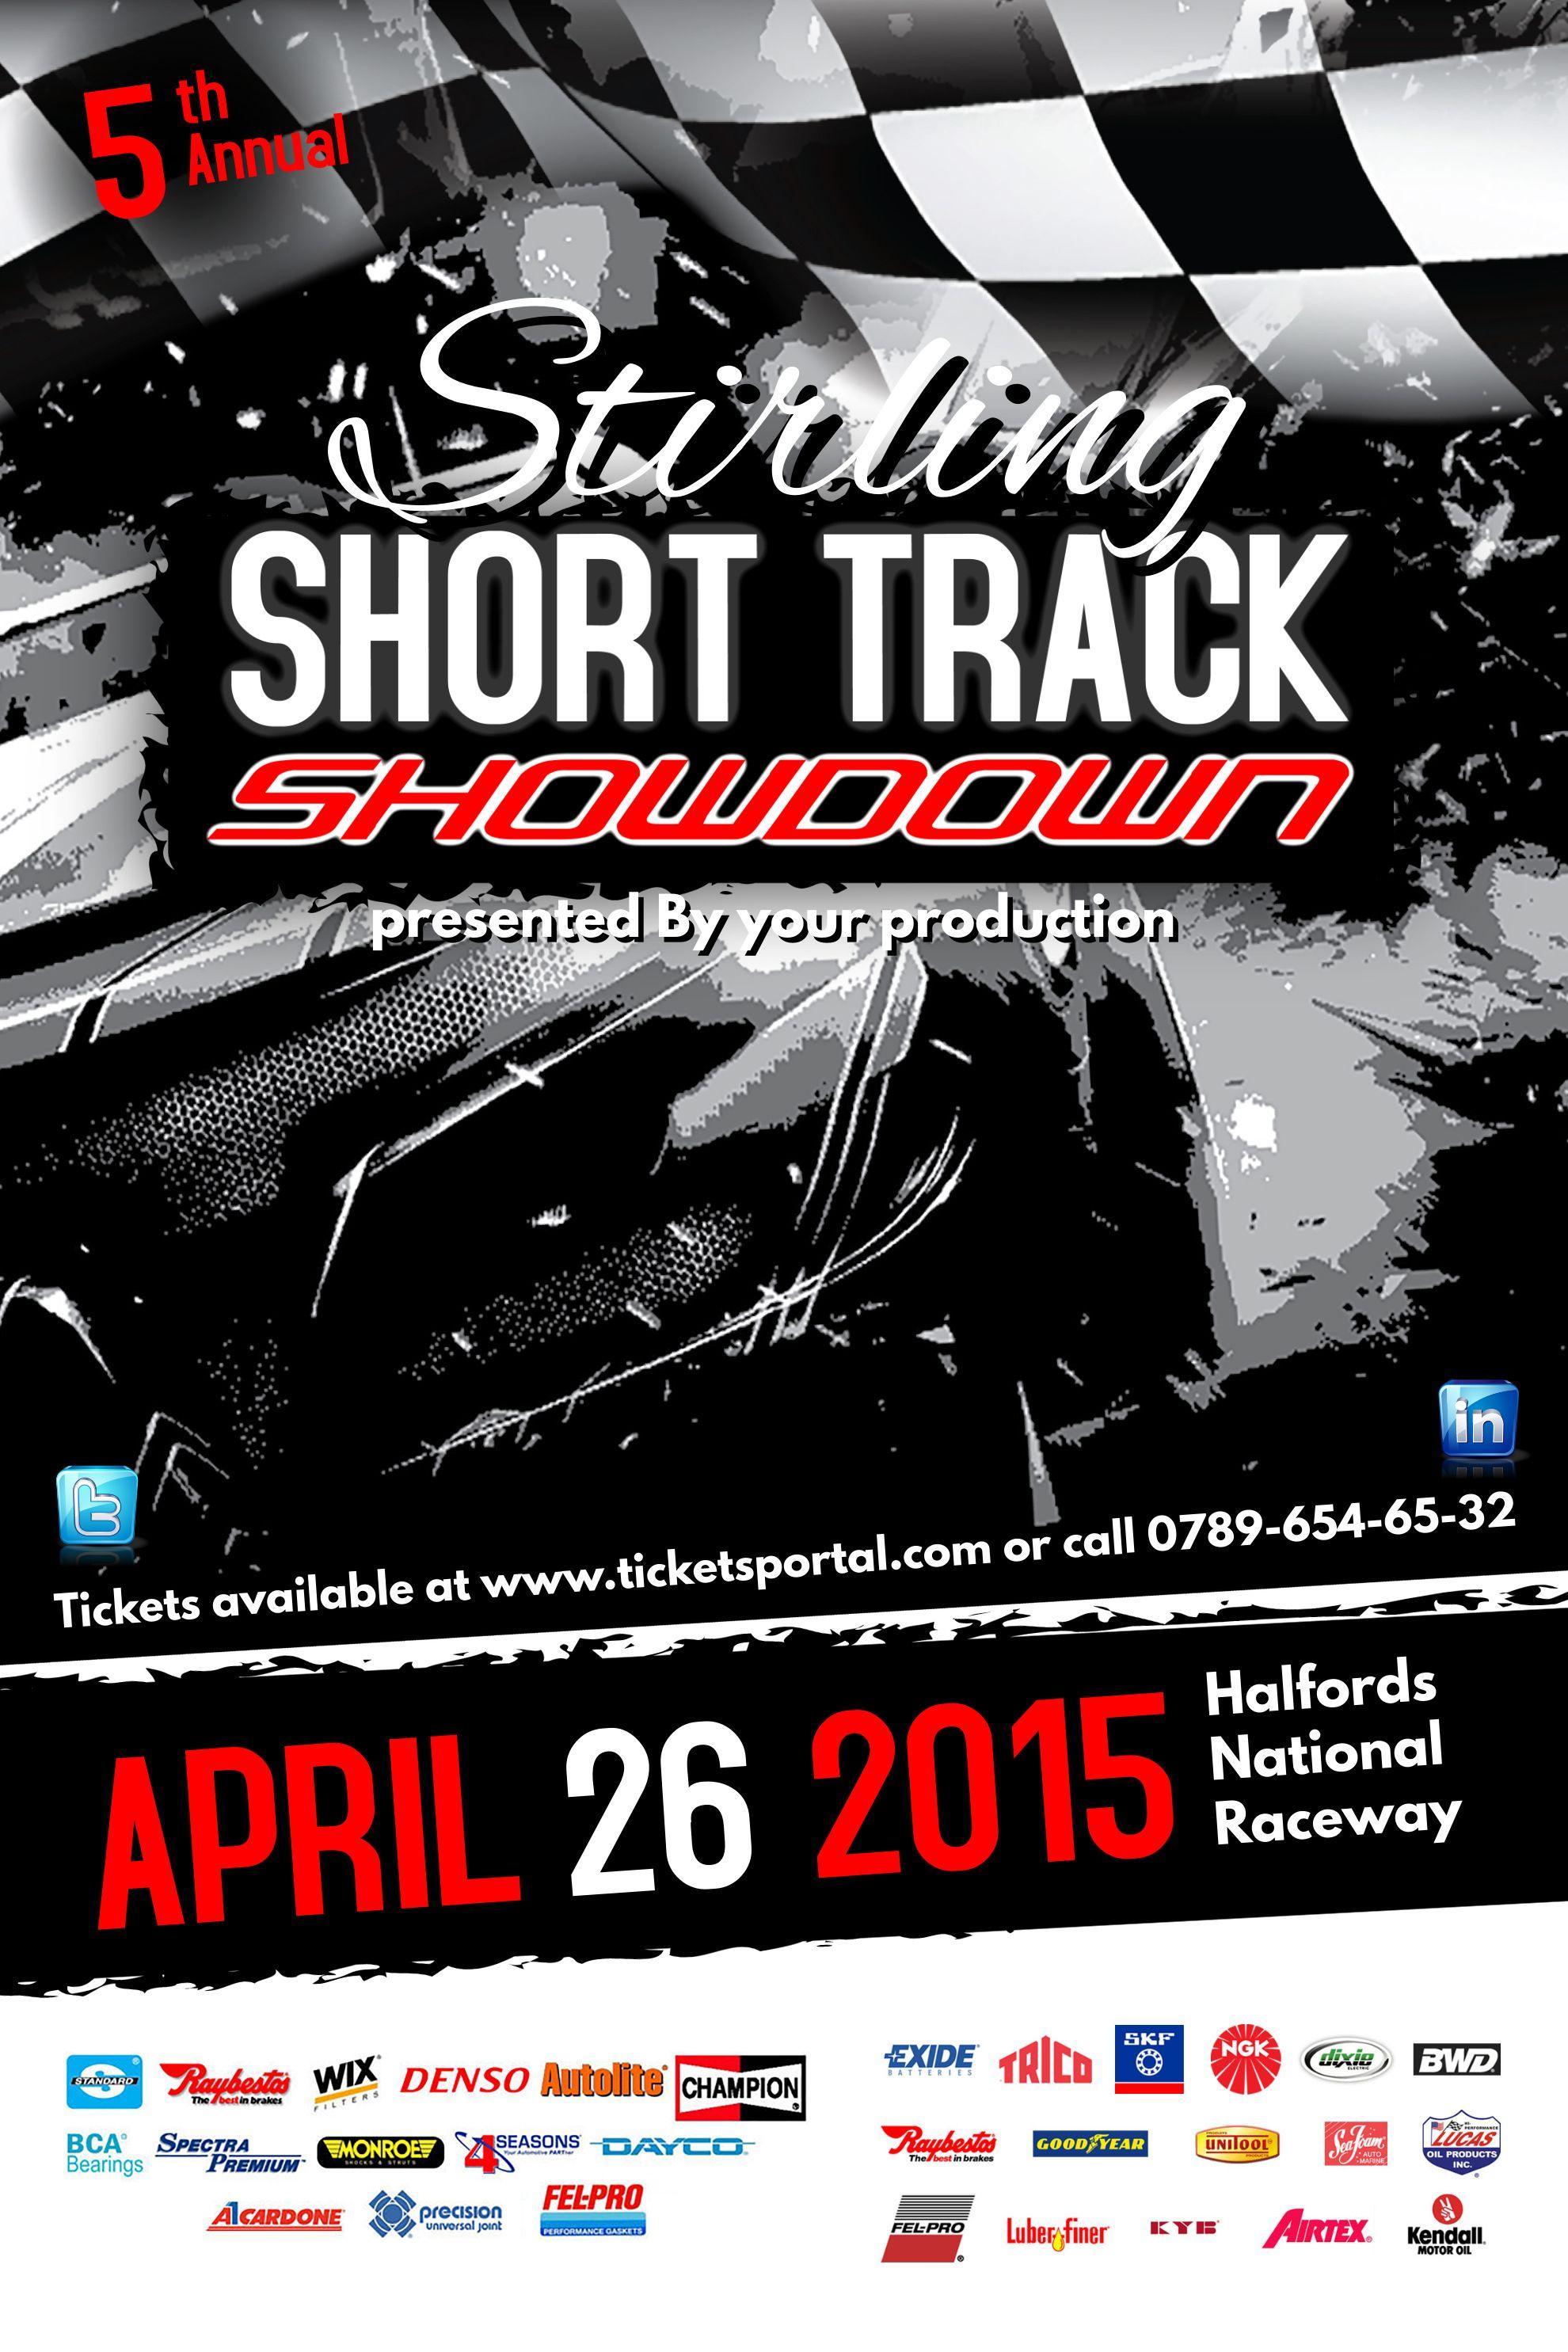 Car Racing Poster Template. | Sports Poster Templates | Pinterest